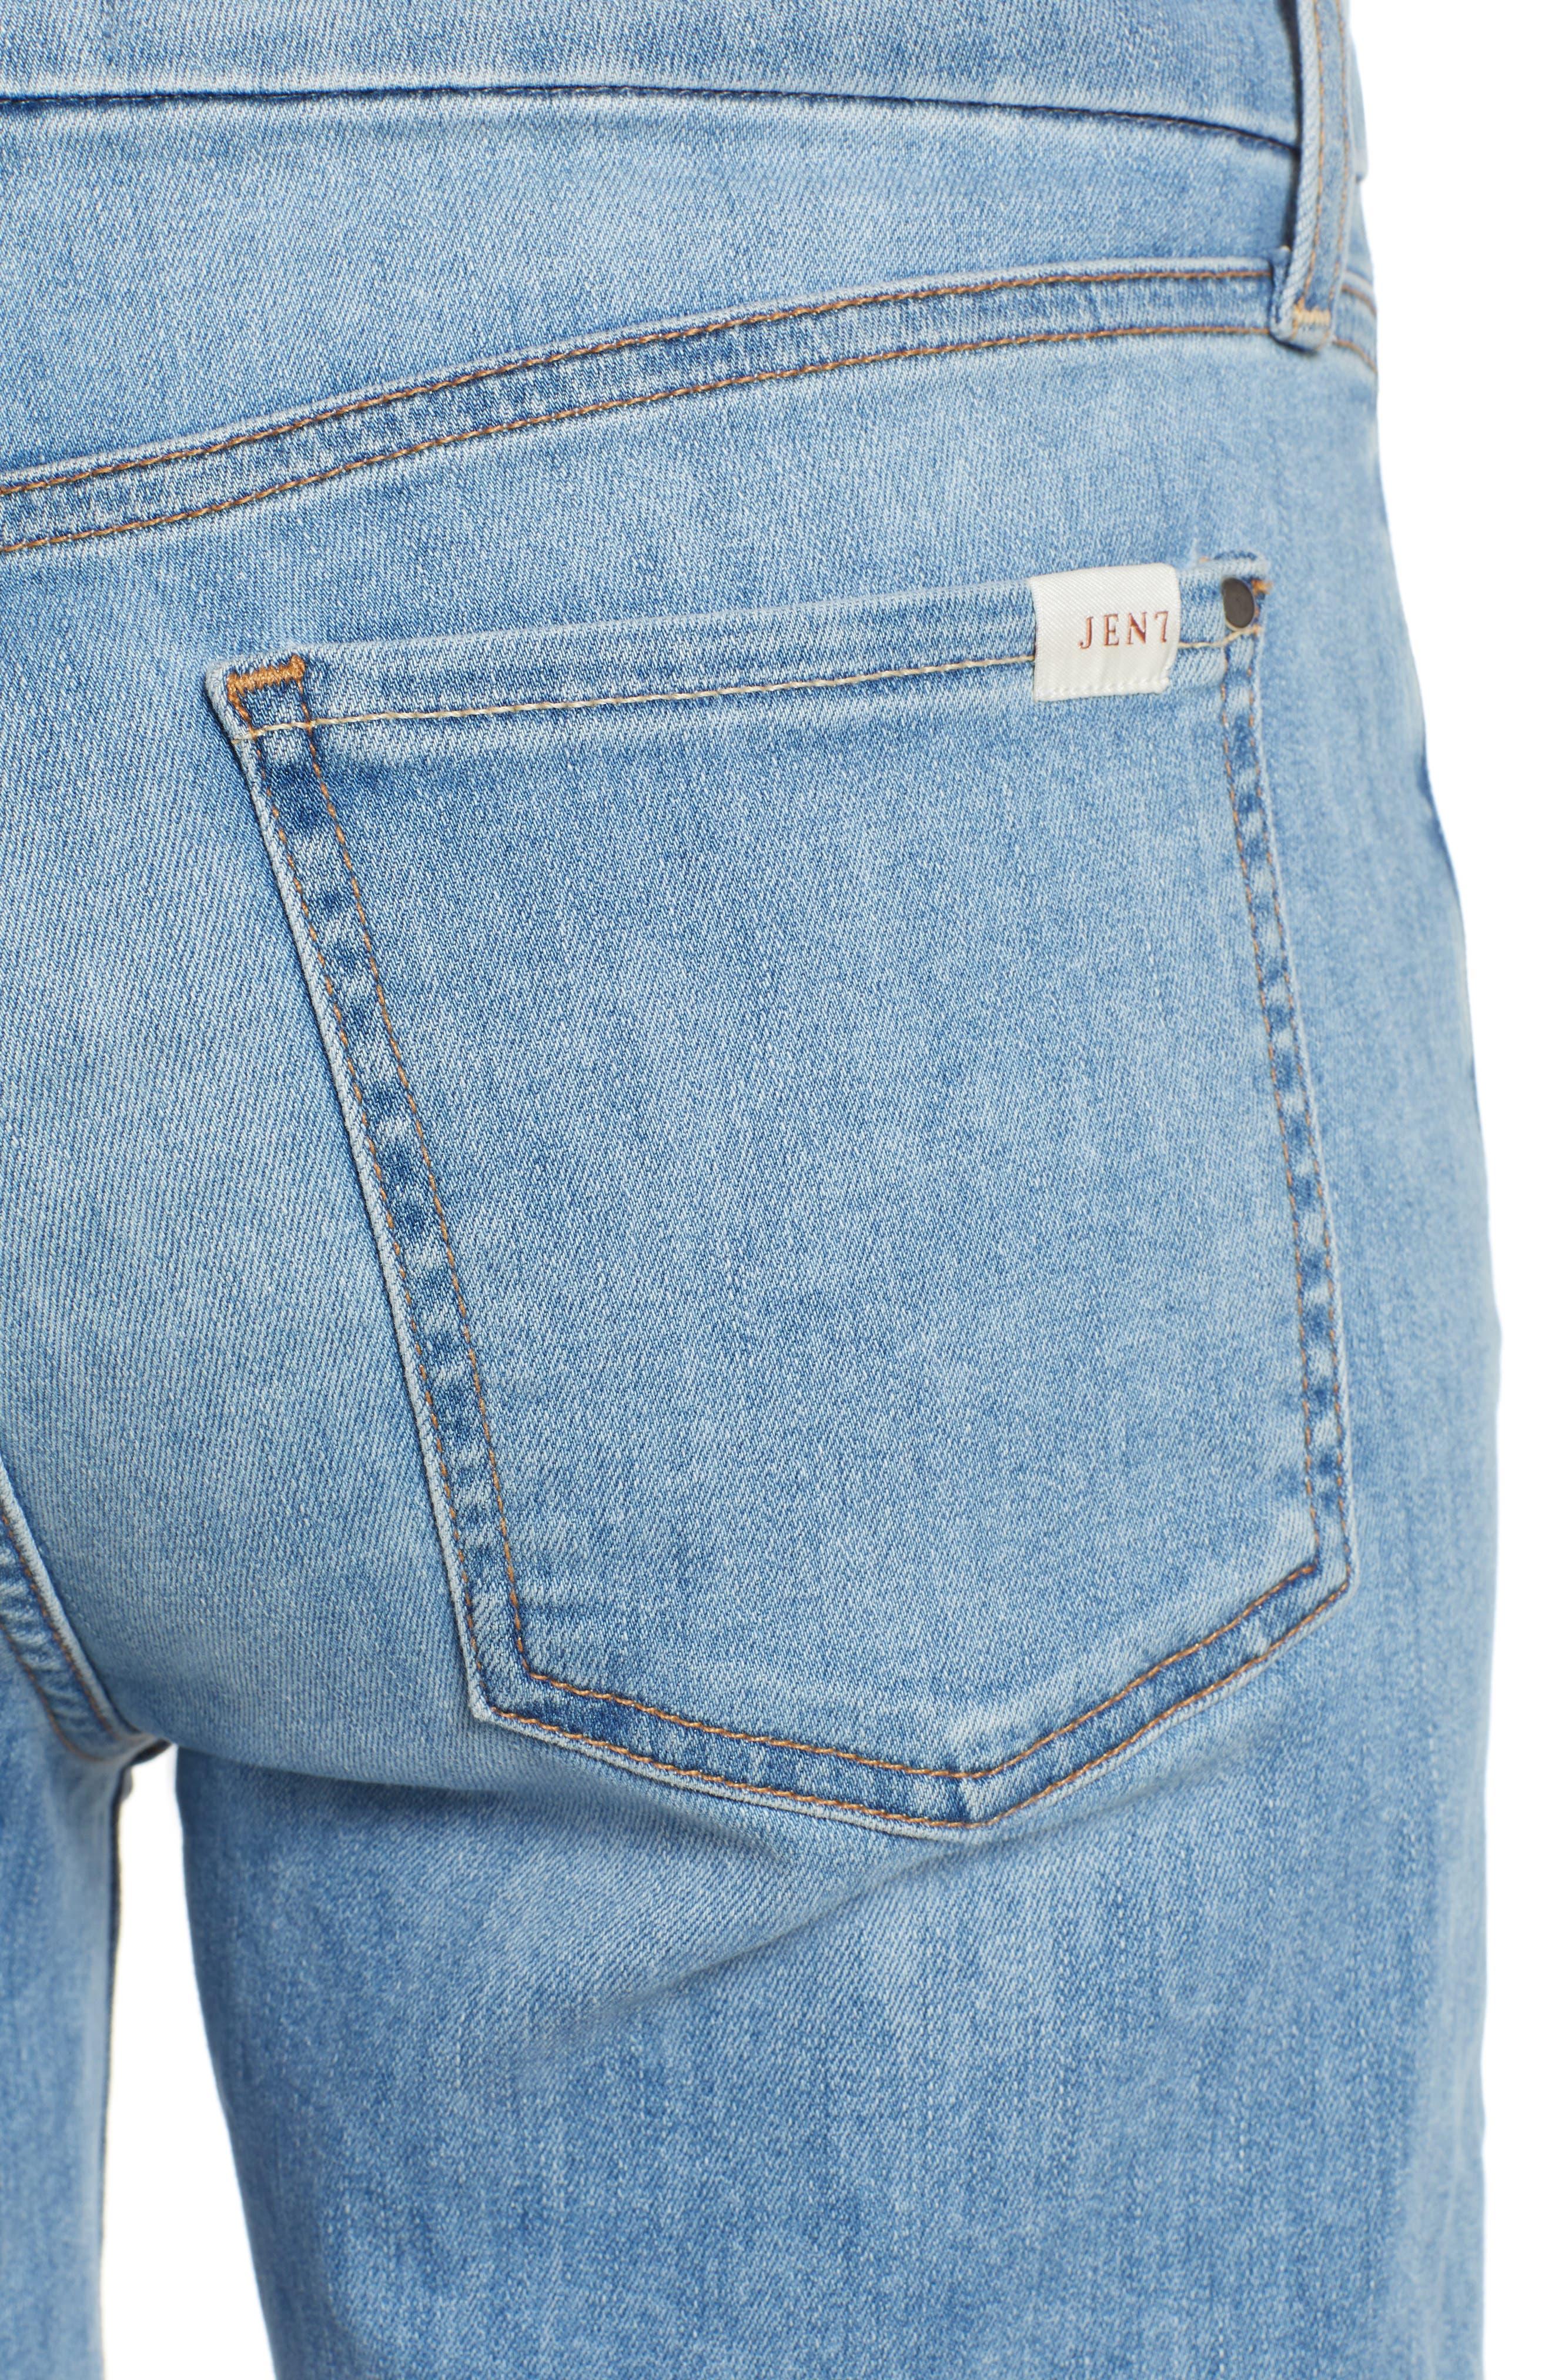 JEN7 BY 7 FOR ALL MANKIND,                             Roll Cuff Bermuda Shorts,                             Alternate thumbnail 4, color,                             LA QUINTA